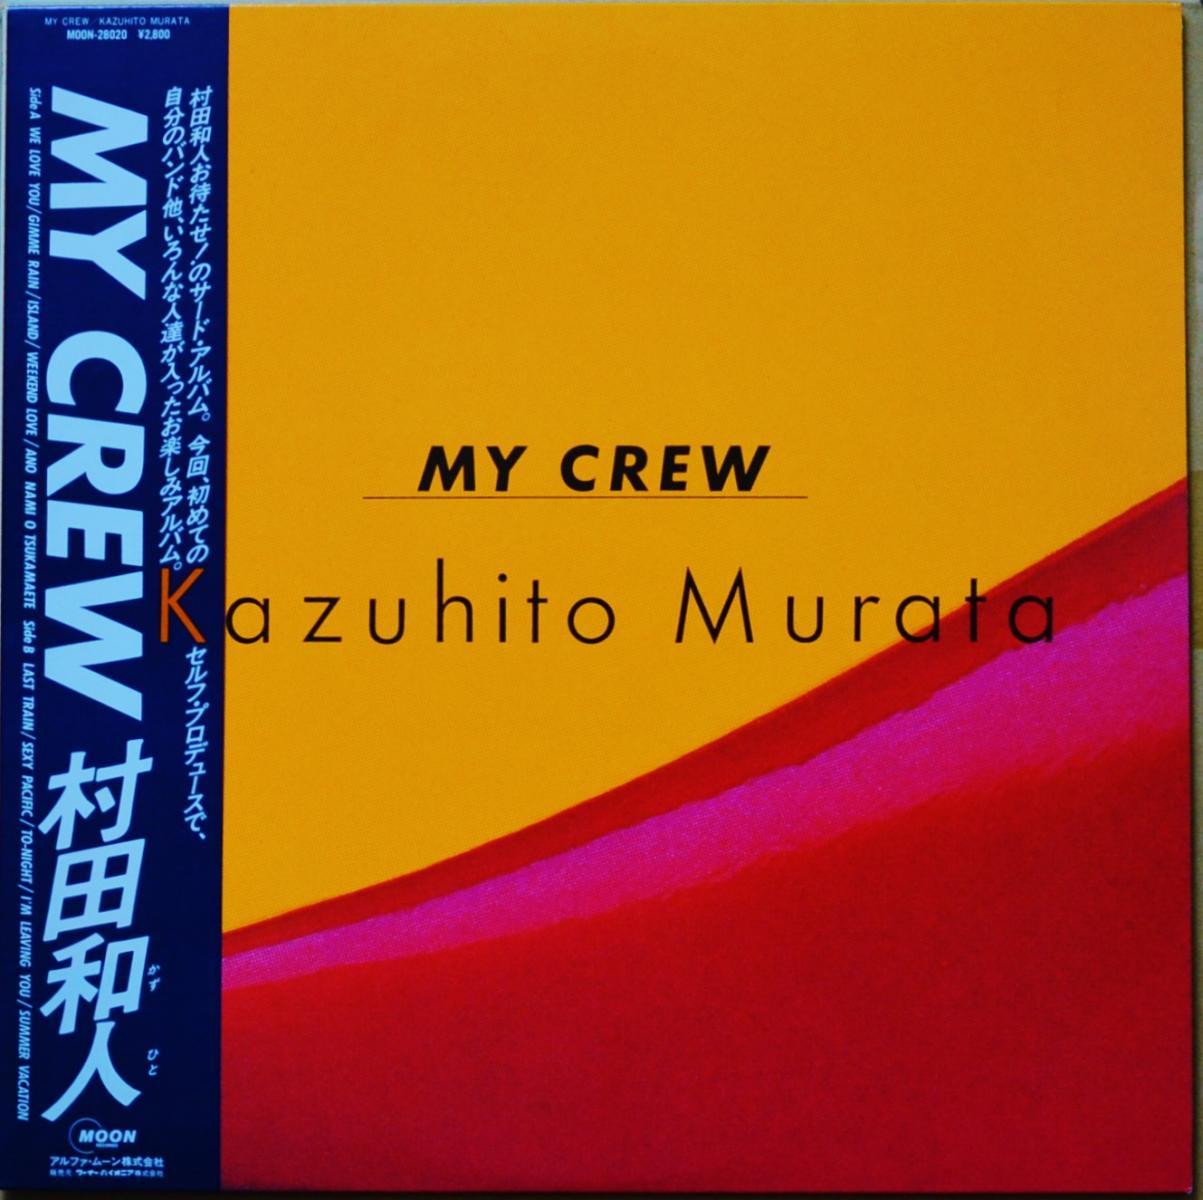 村田和人 KAZUHITO MURATA / MY CREW (LP)